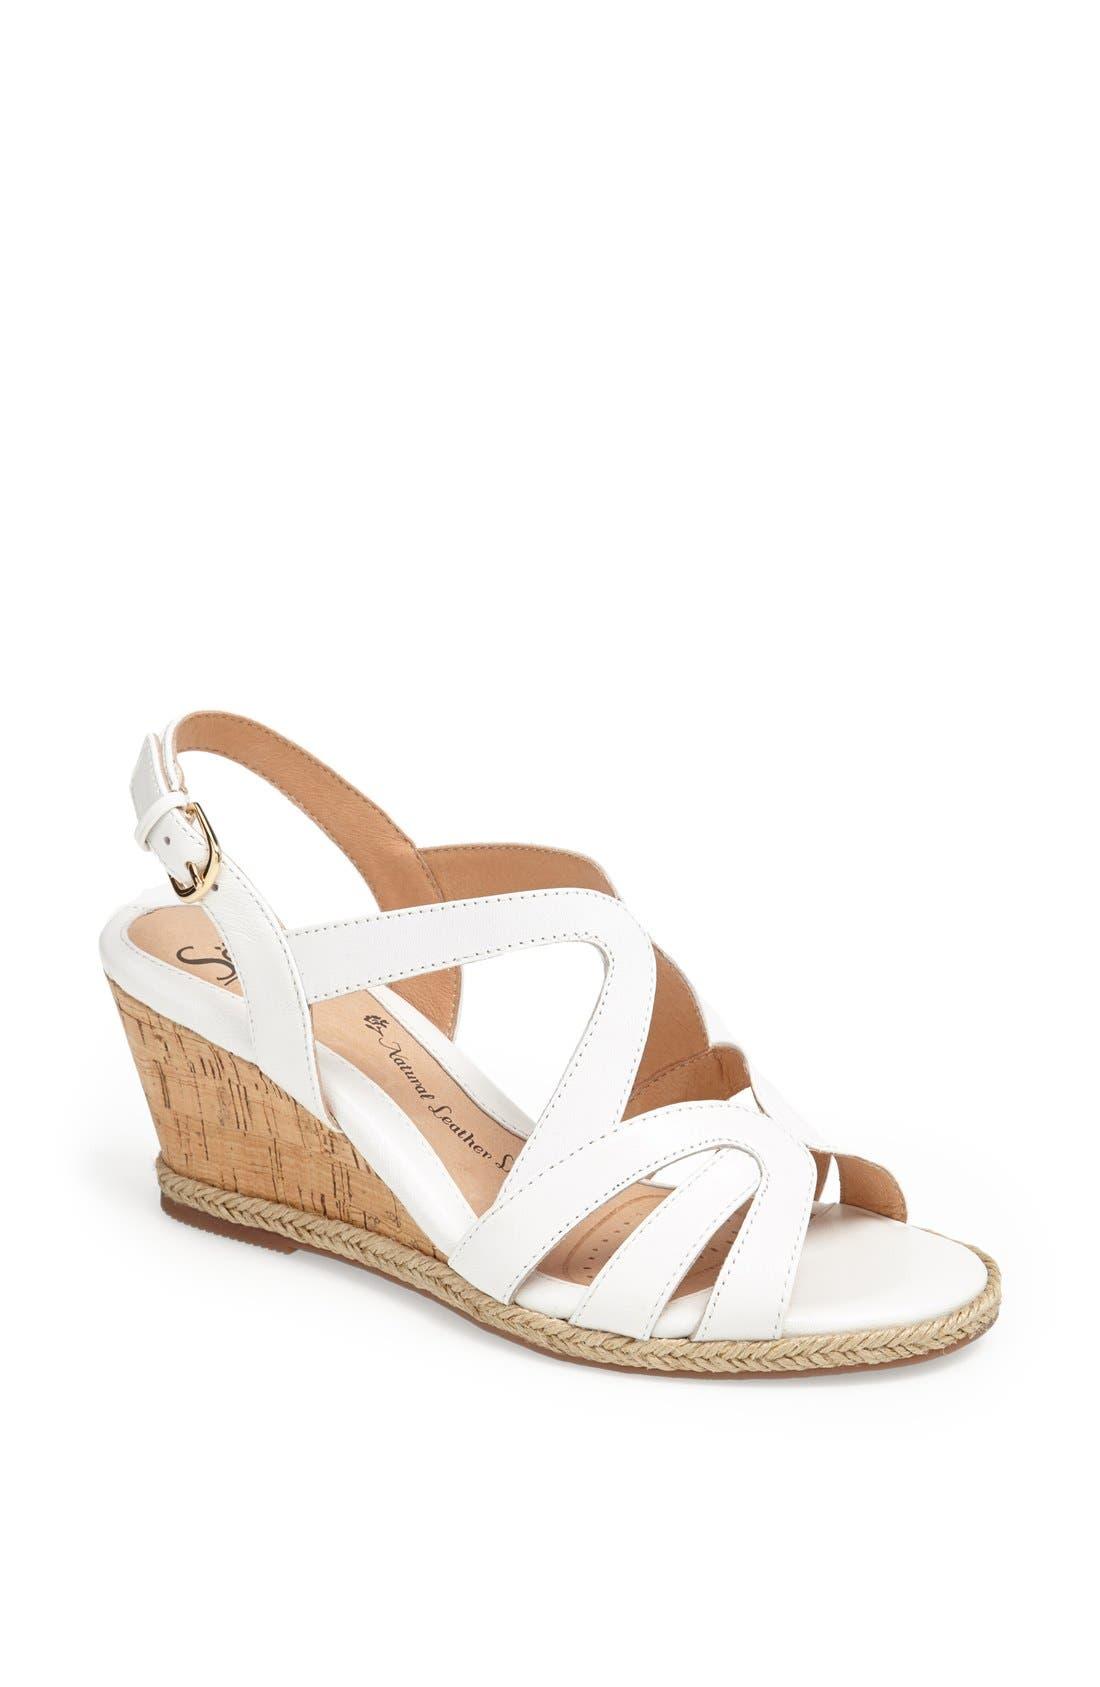 Main Image - Söfft 'Ilene' Wedge Sandal